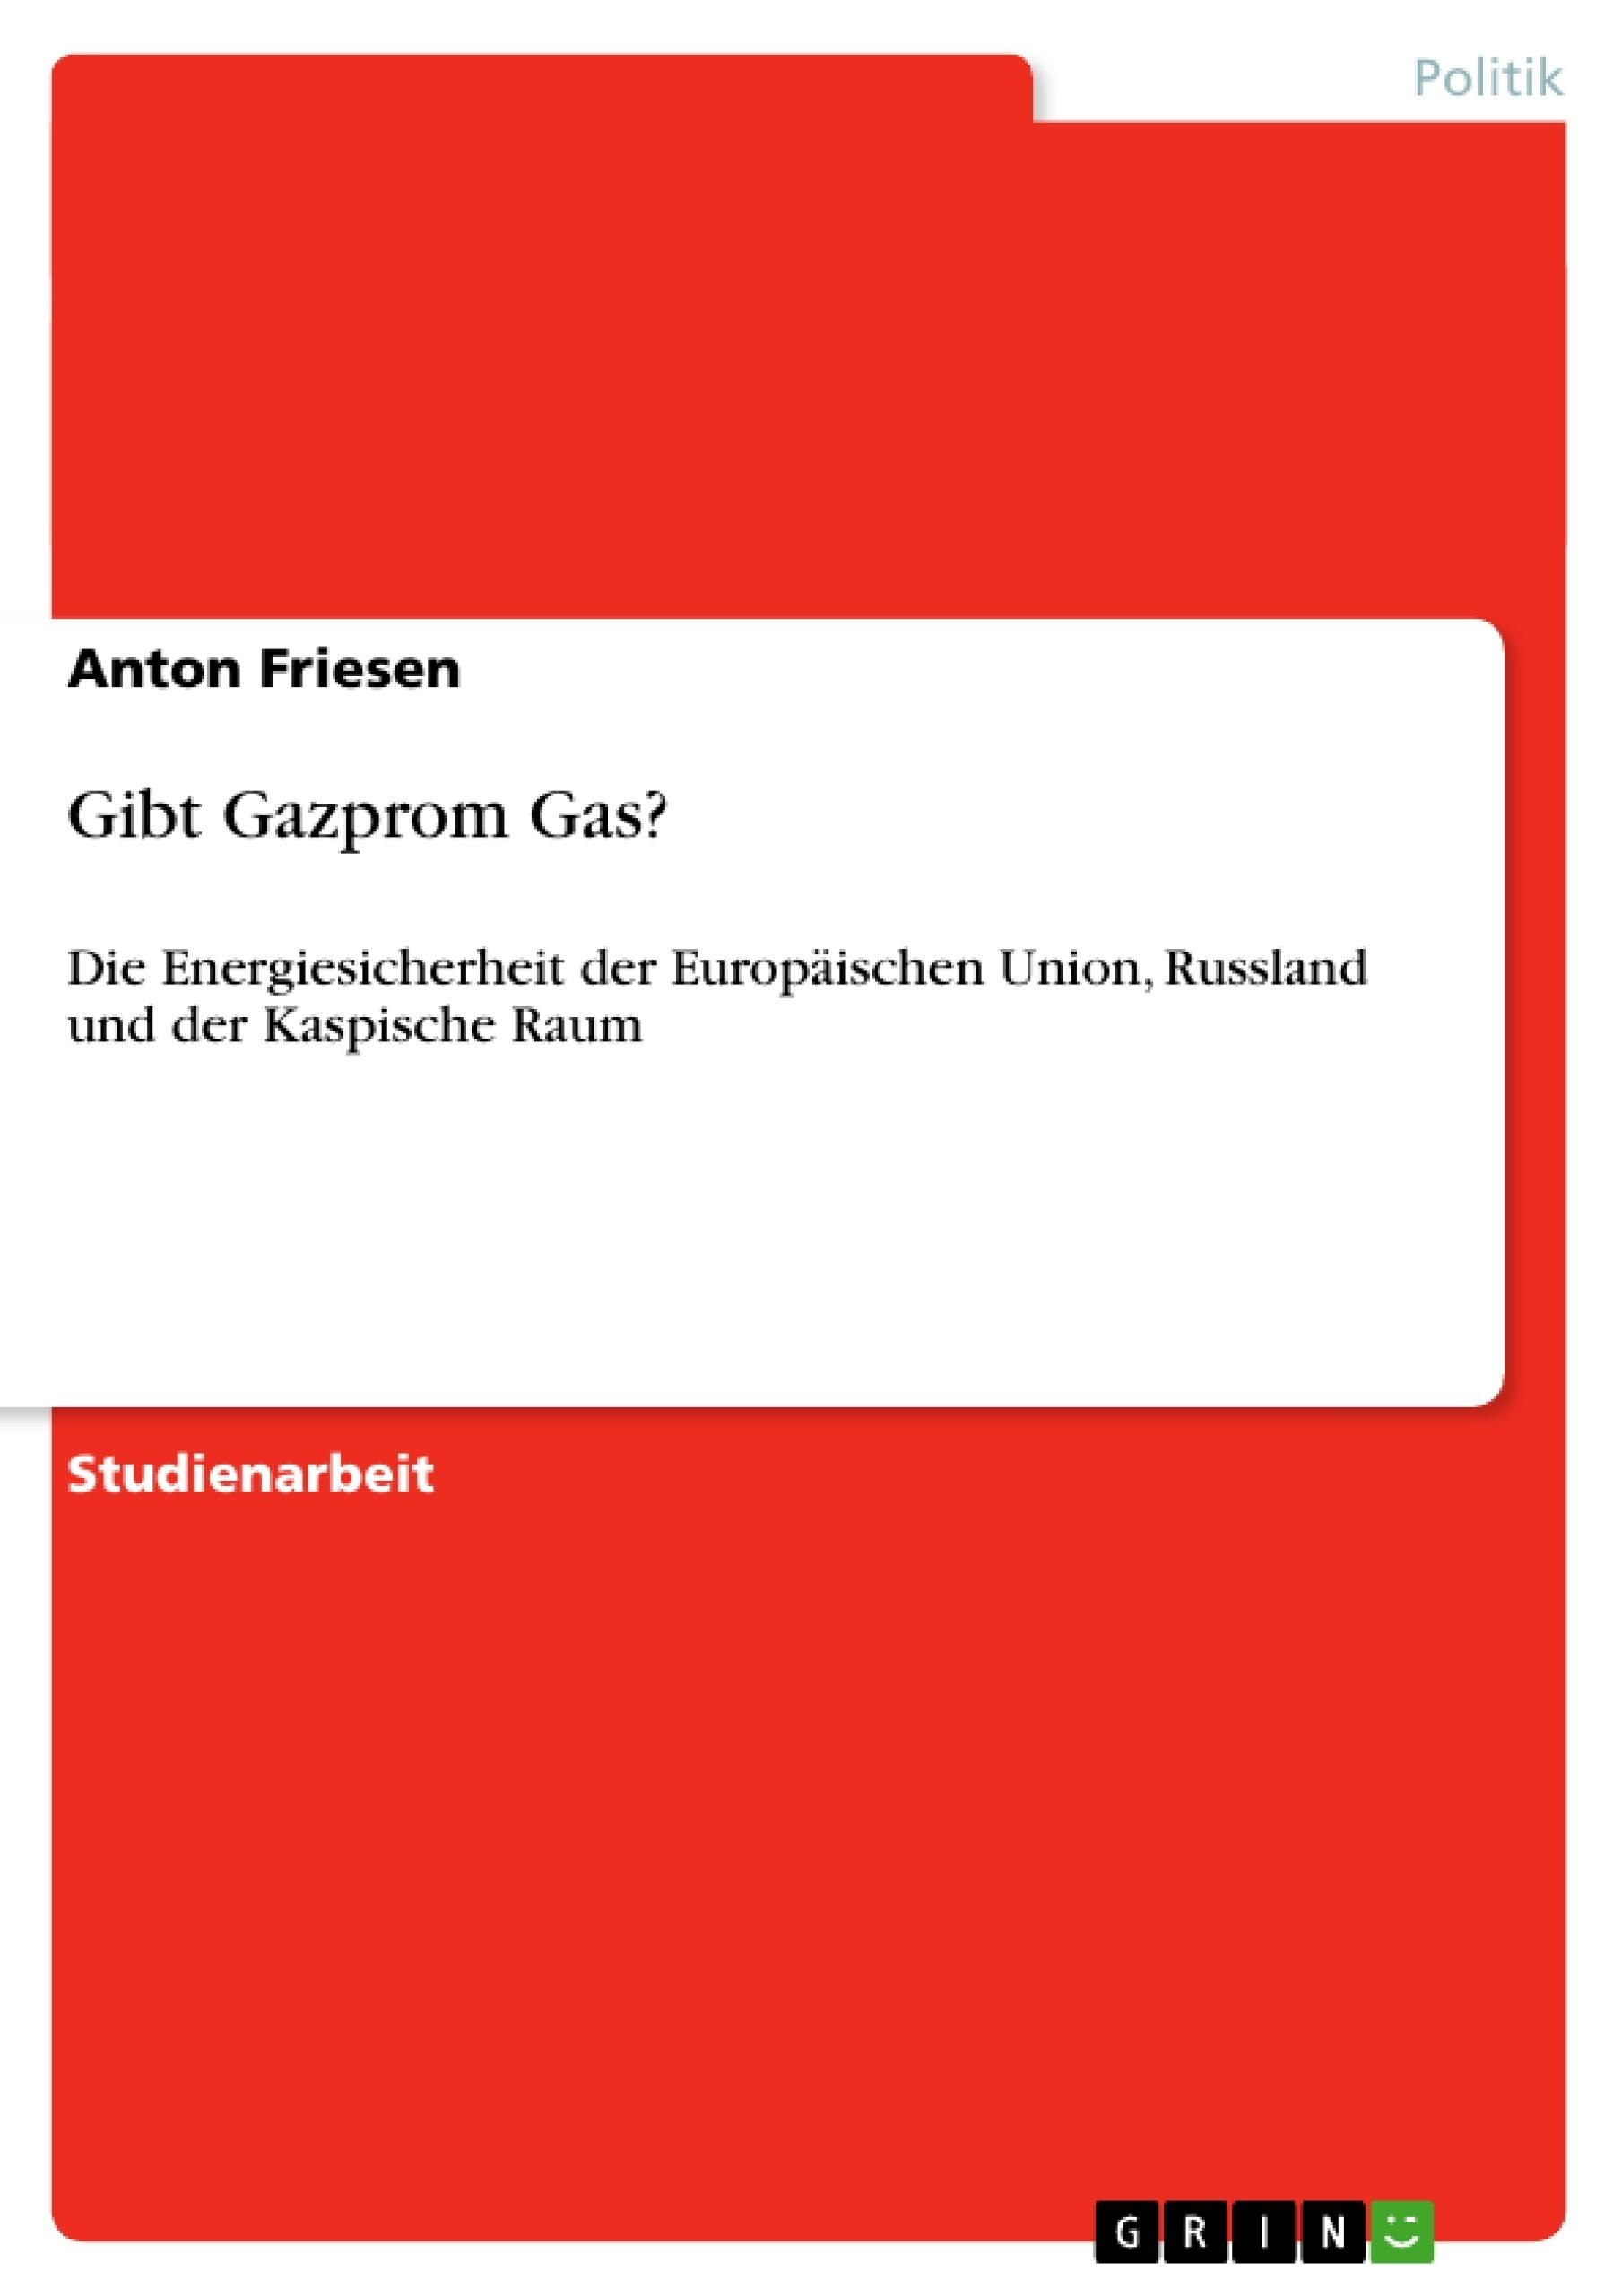 Titel: Gibt Gazprom Gas?